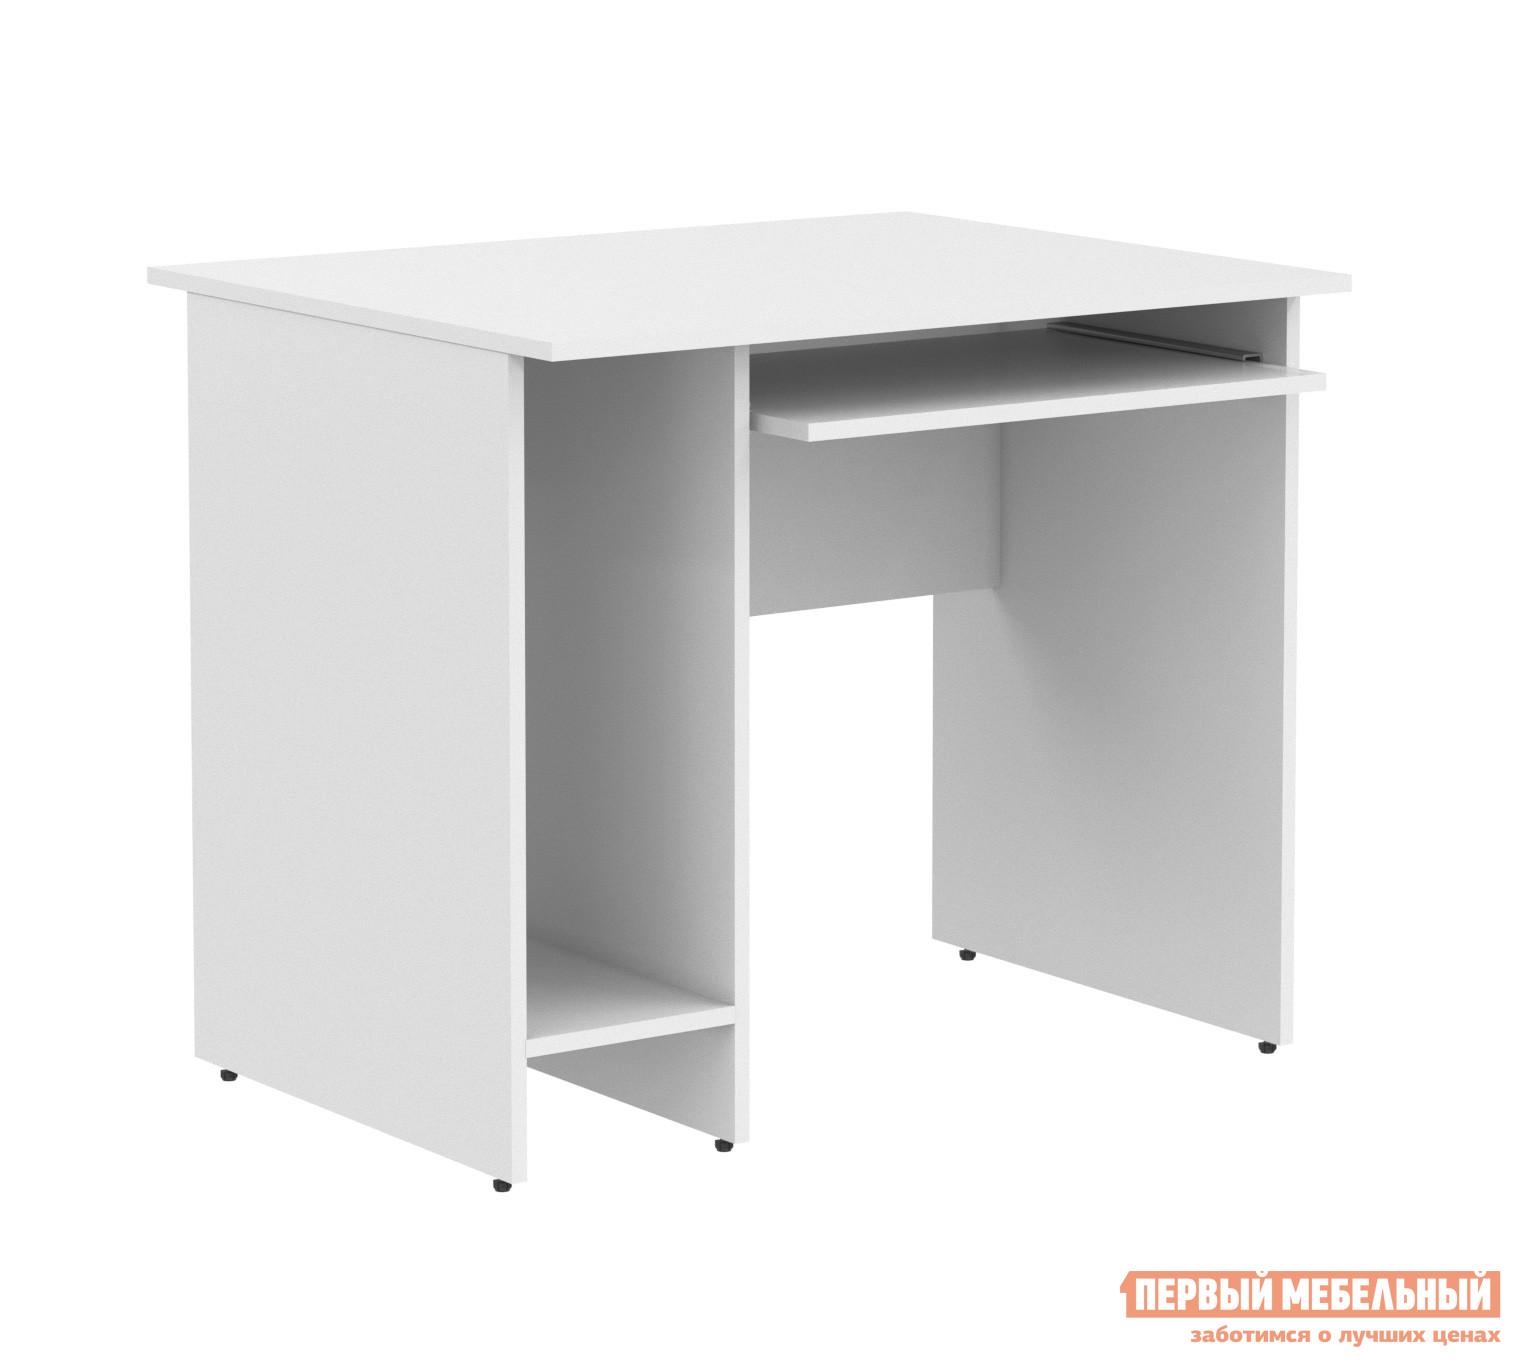 Компьютерный стол Тайпит СК-1 paulmann 92617